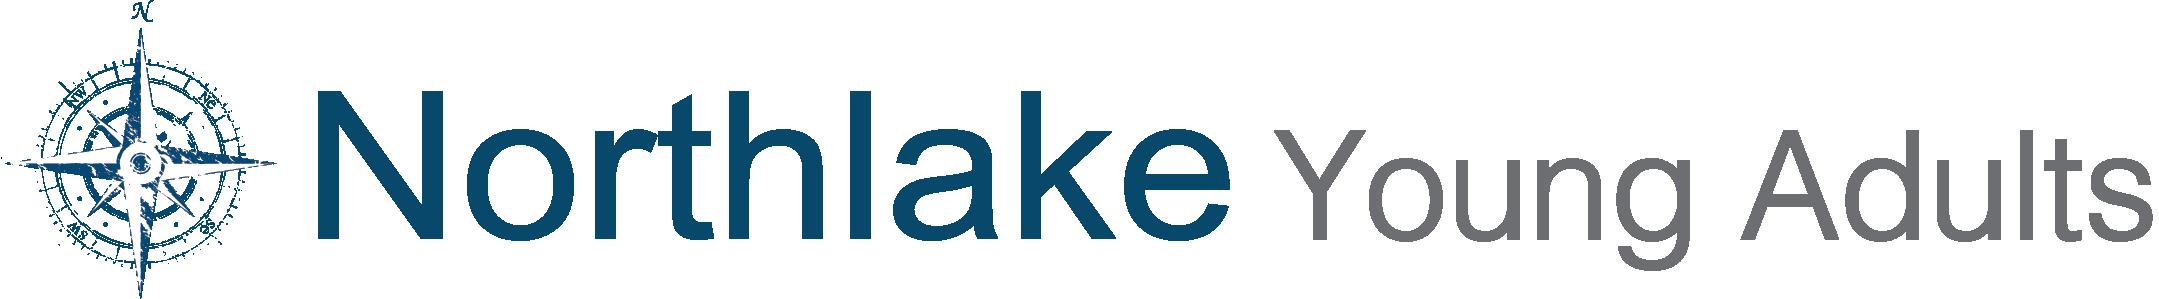 northlake young adults logo.png